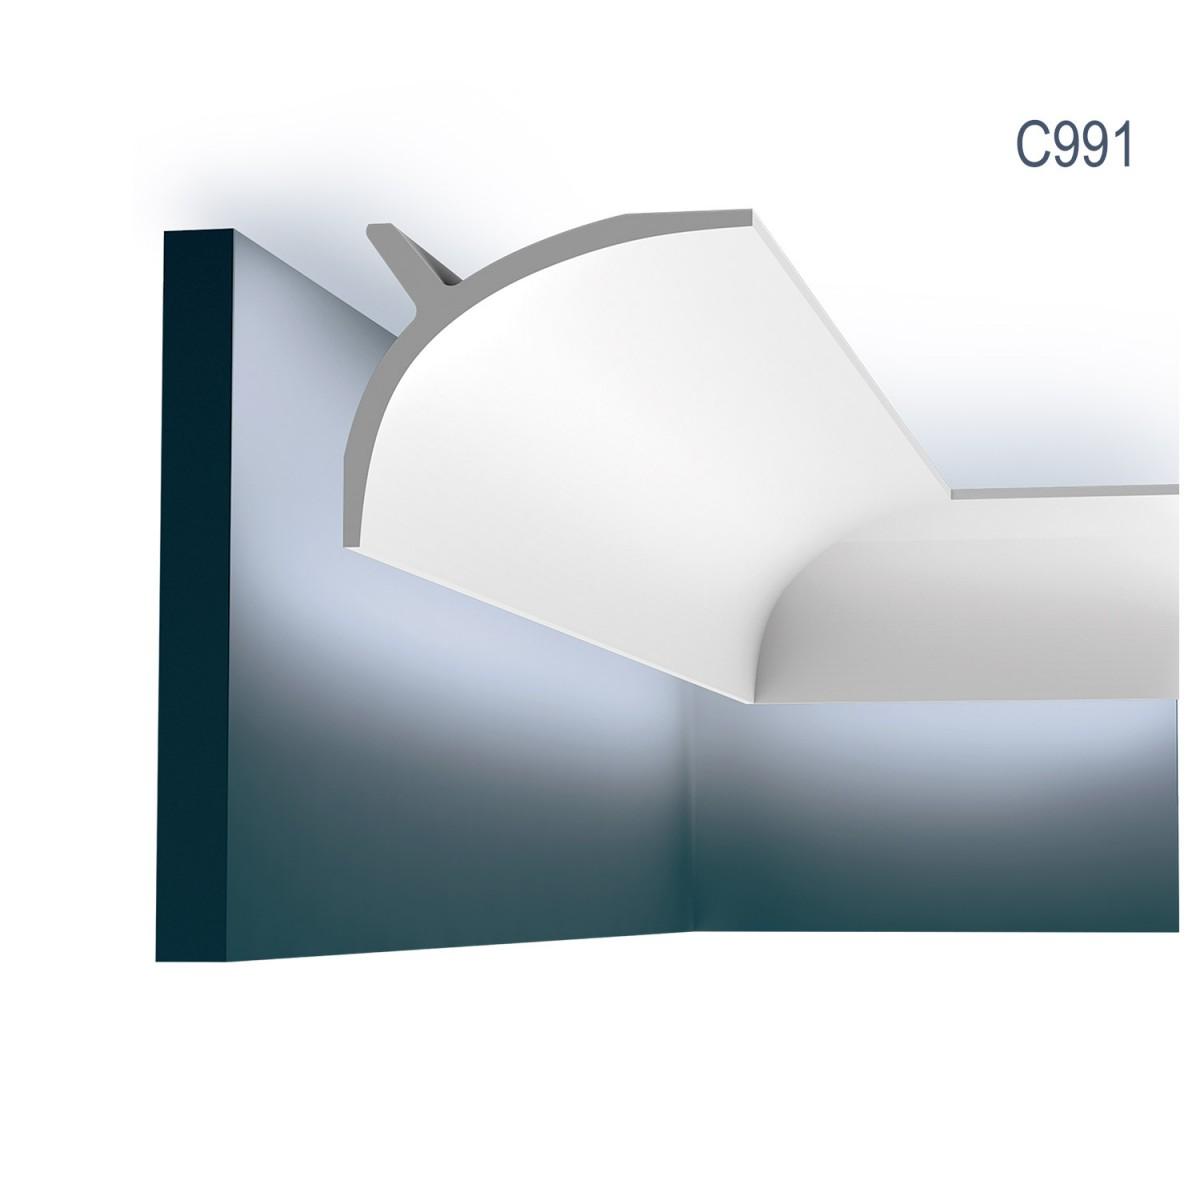 Cornisa Ulf Moritz C991, Dimensiuni: 200 X 14 X 11 cm, Orac Decor